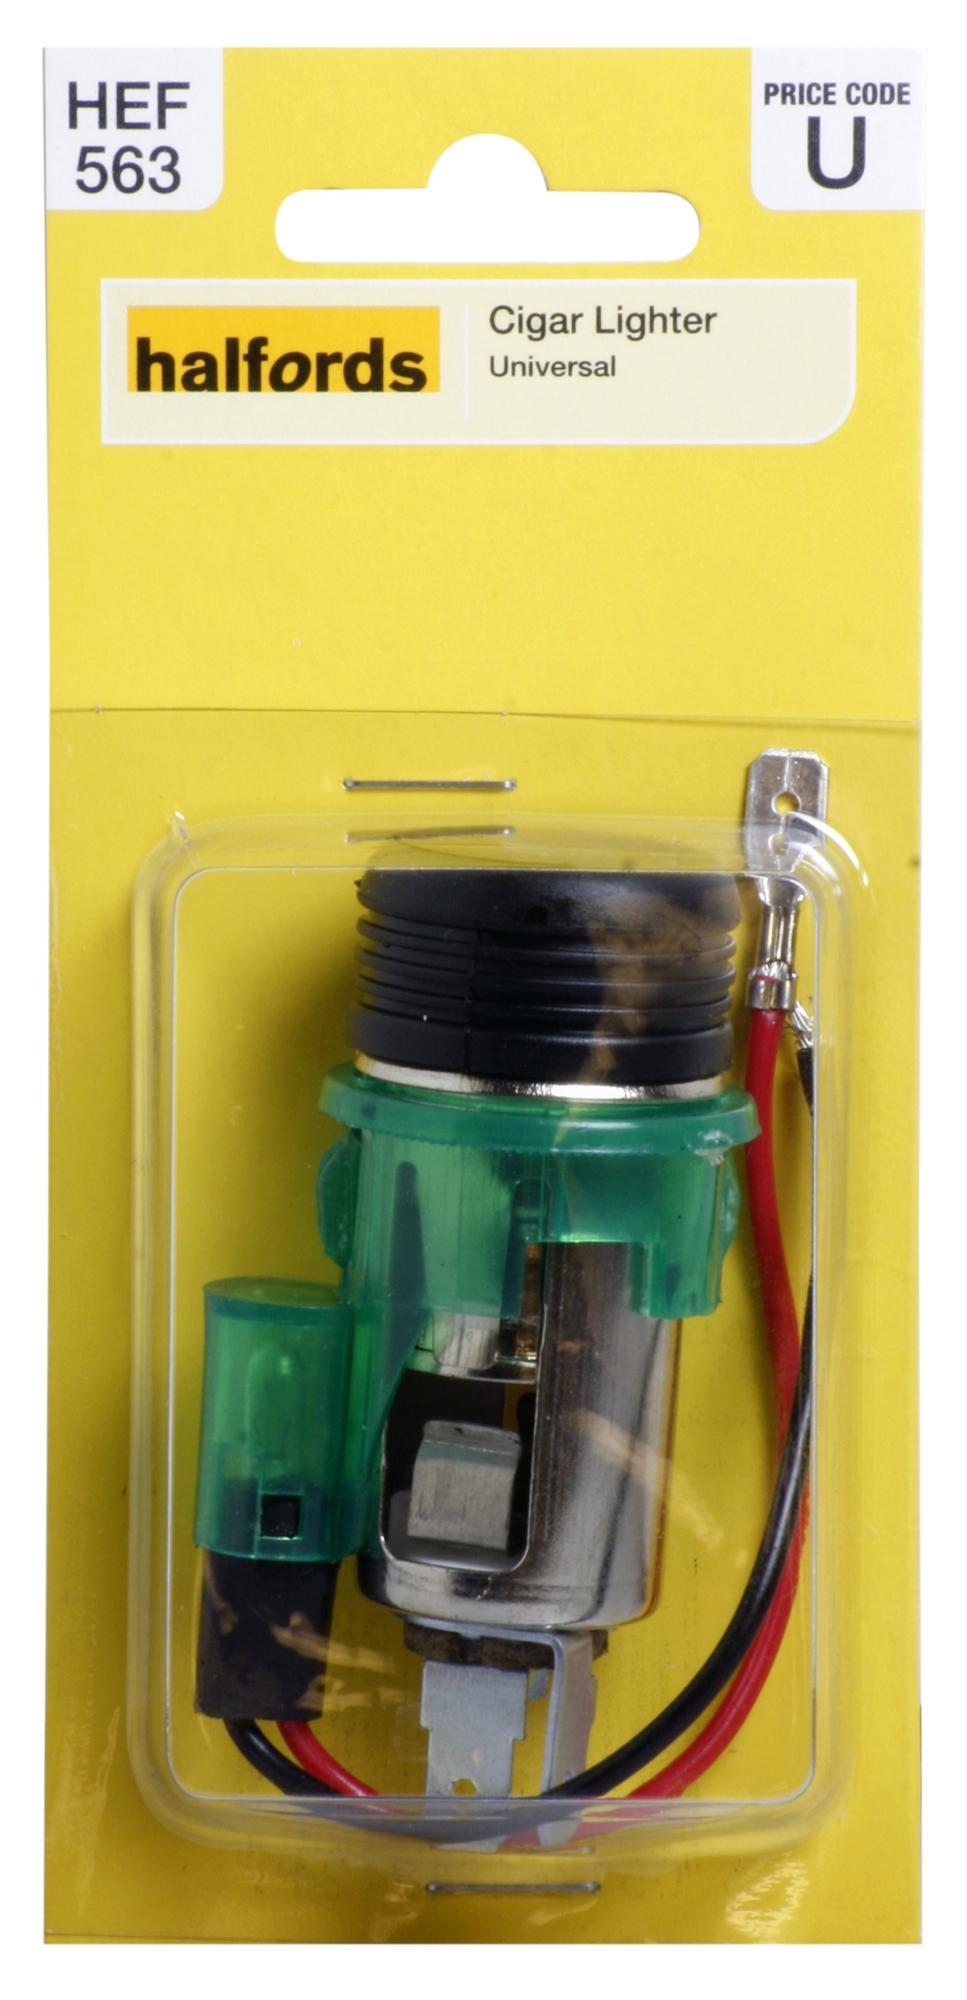 Car Fuse Box Halfords Best Wiring Library Harness Adapter Universal Cigarette Lightehalfords Lighter